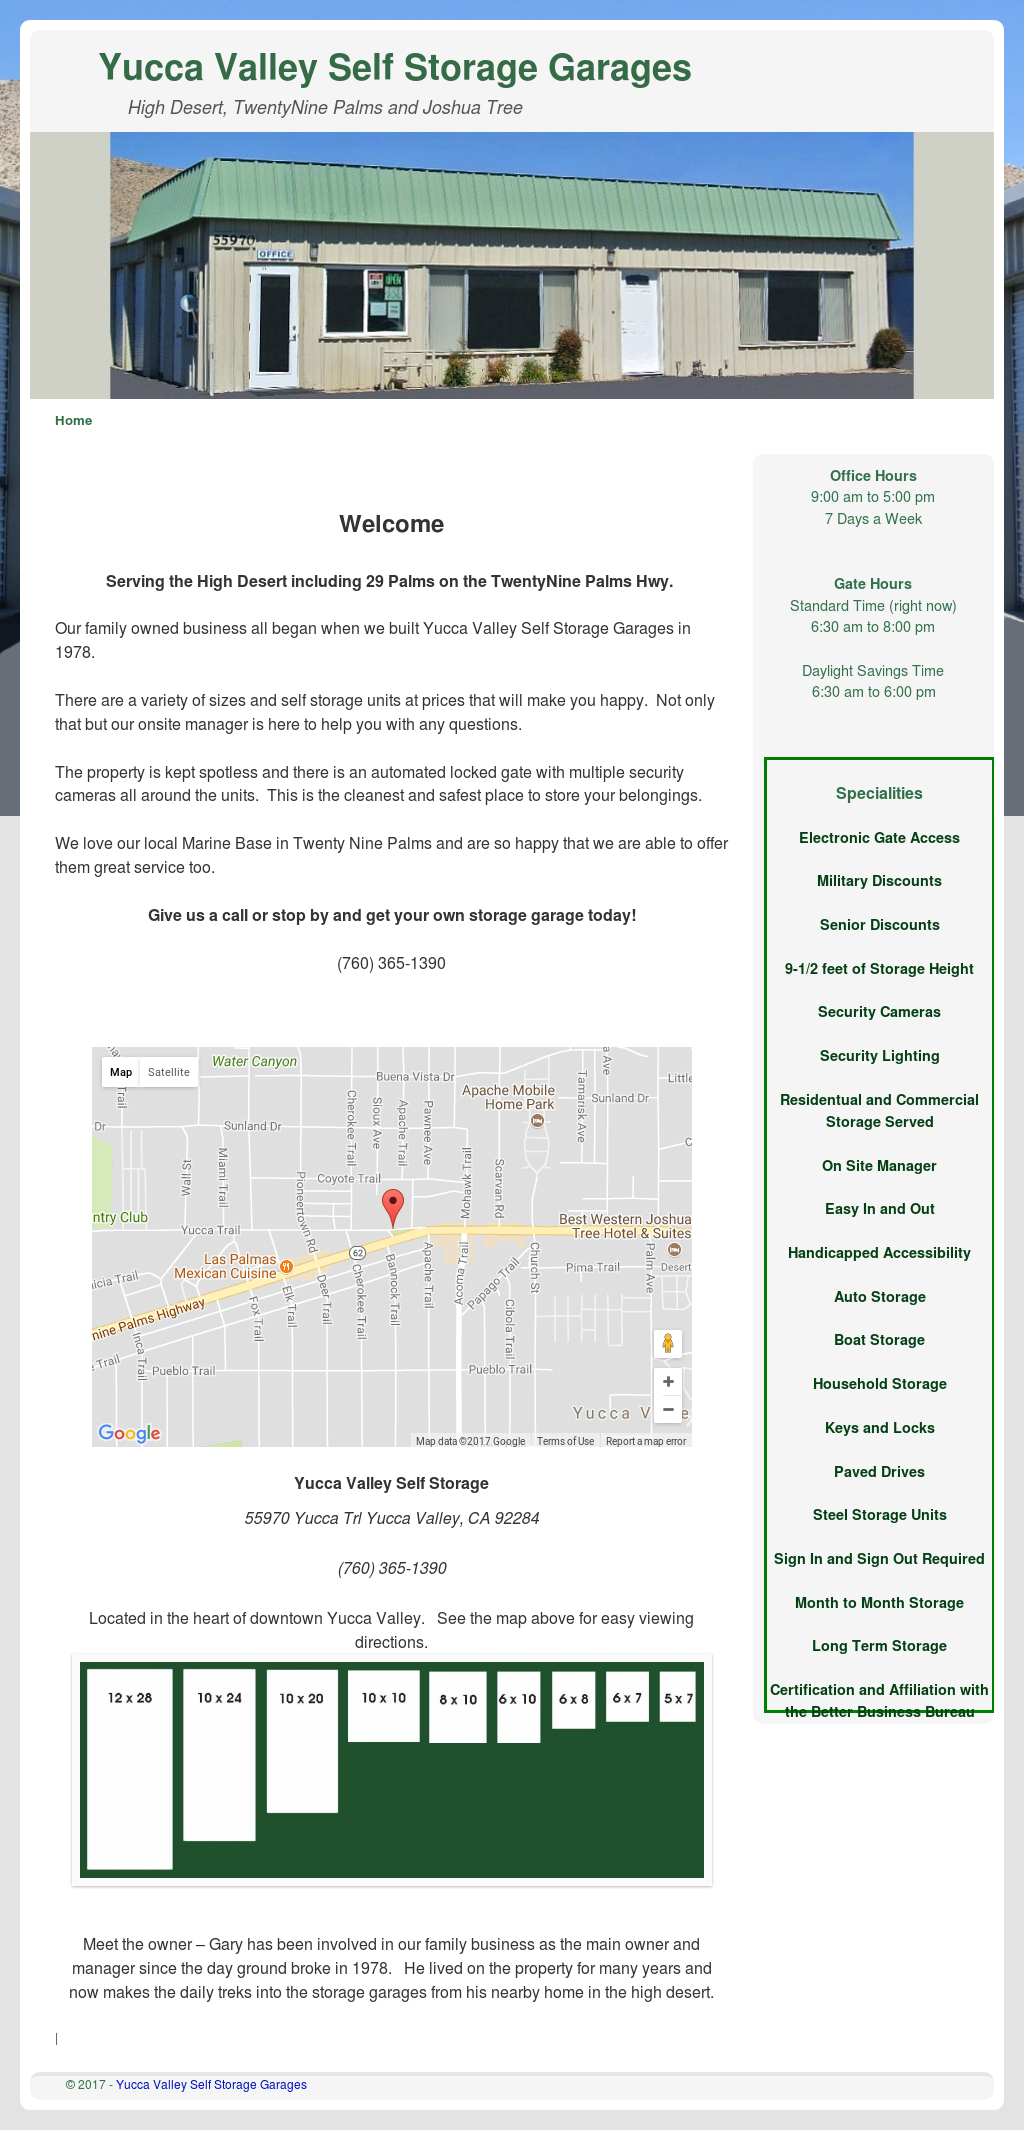 Yucca Valley Self Storage Website History